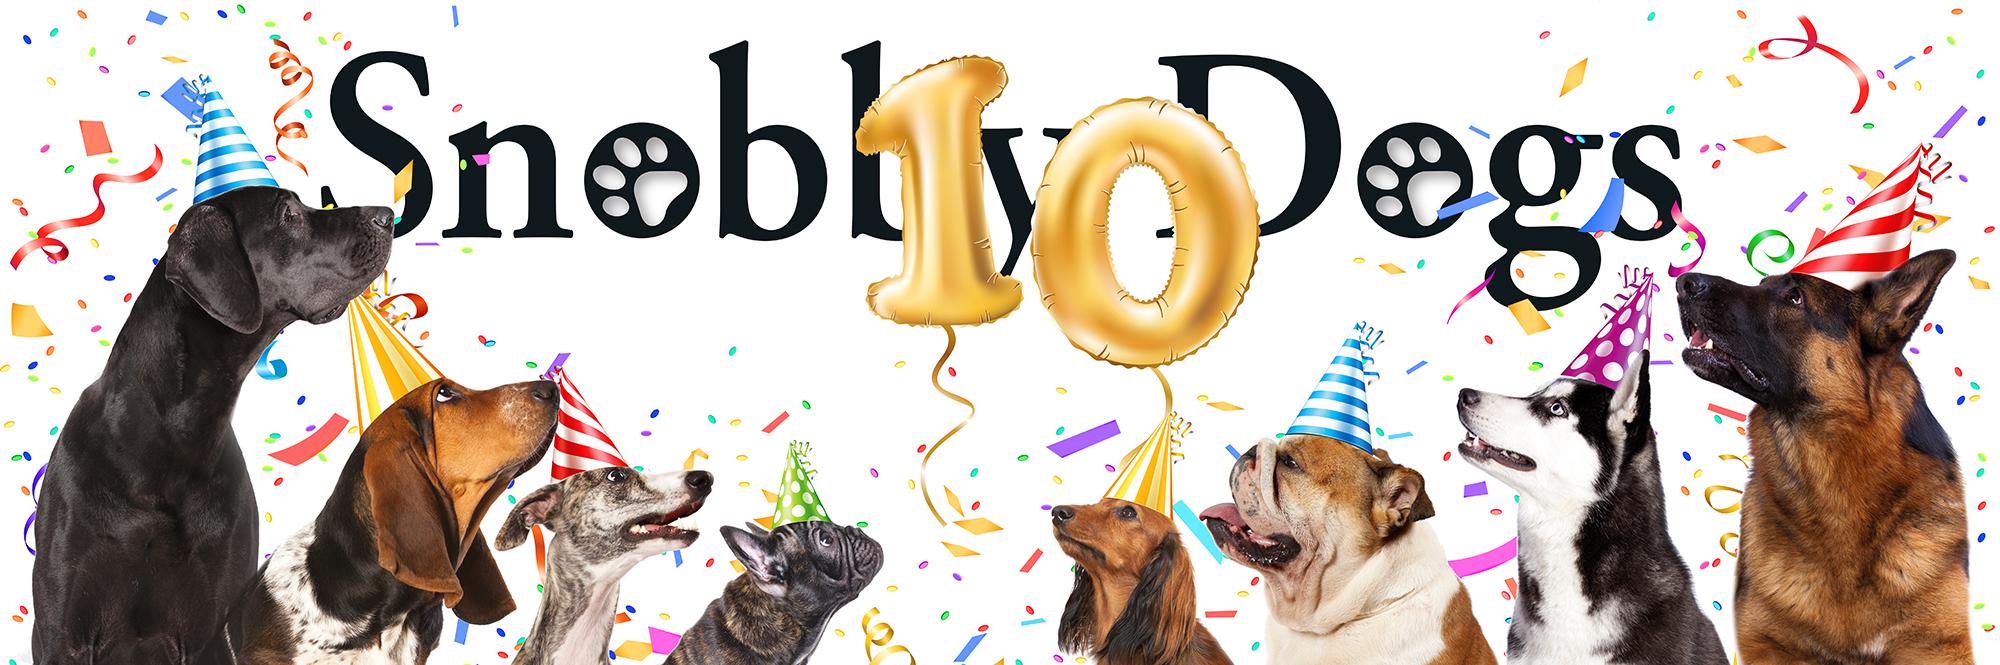 SnobbyDogs home page. Dog grooming, franchise, pet sitting, dog walking.